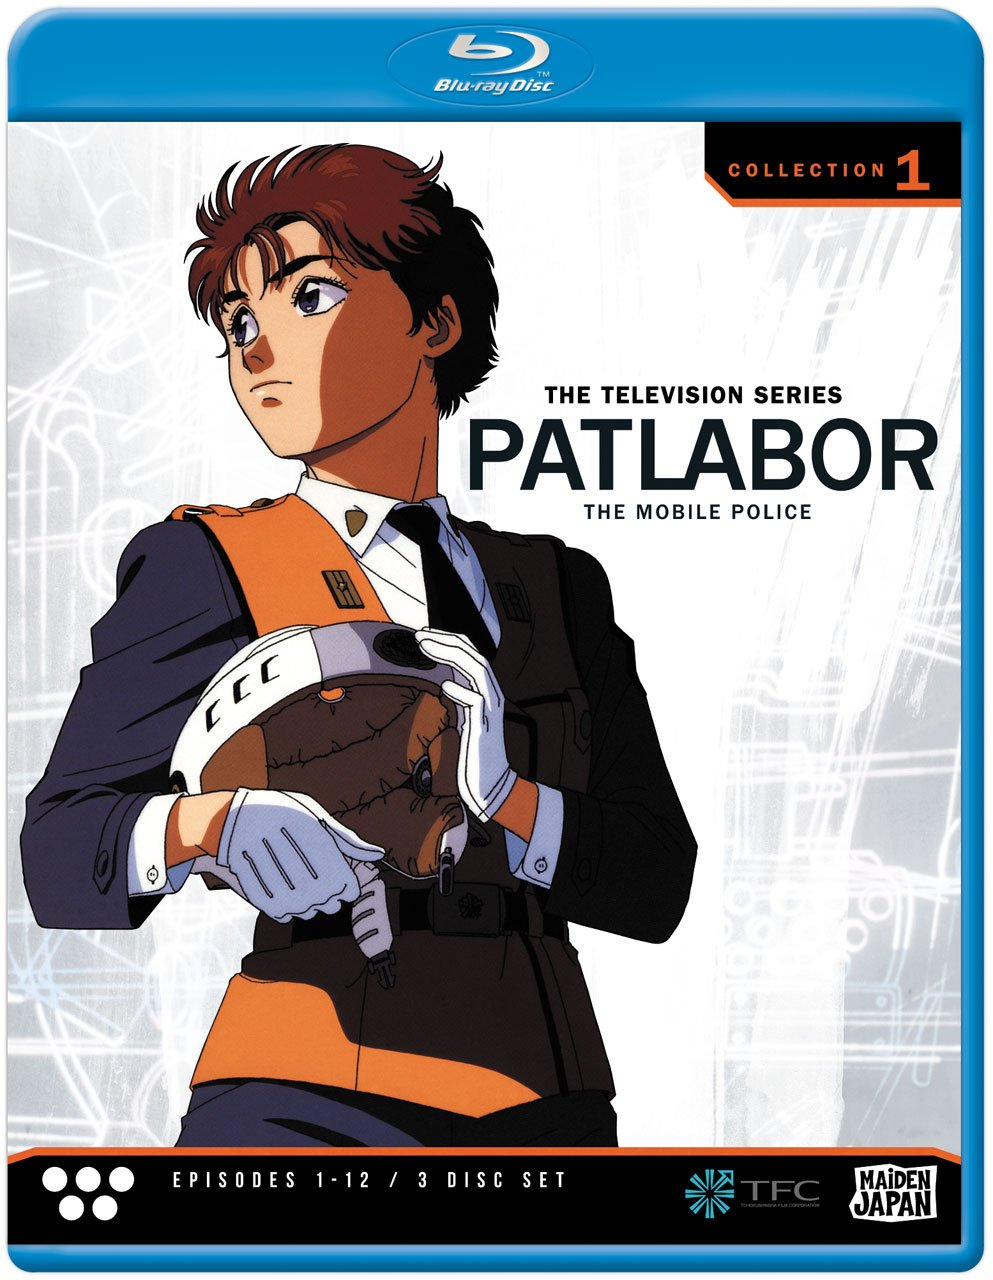 Kidou Keisatsu Patlabor: On Television (Sub)